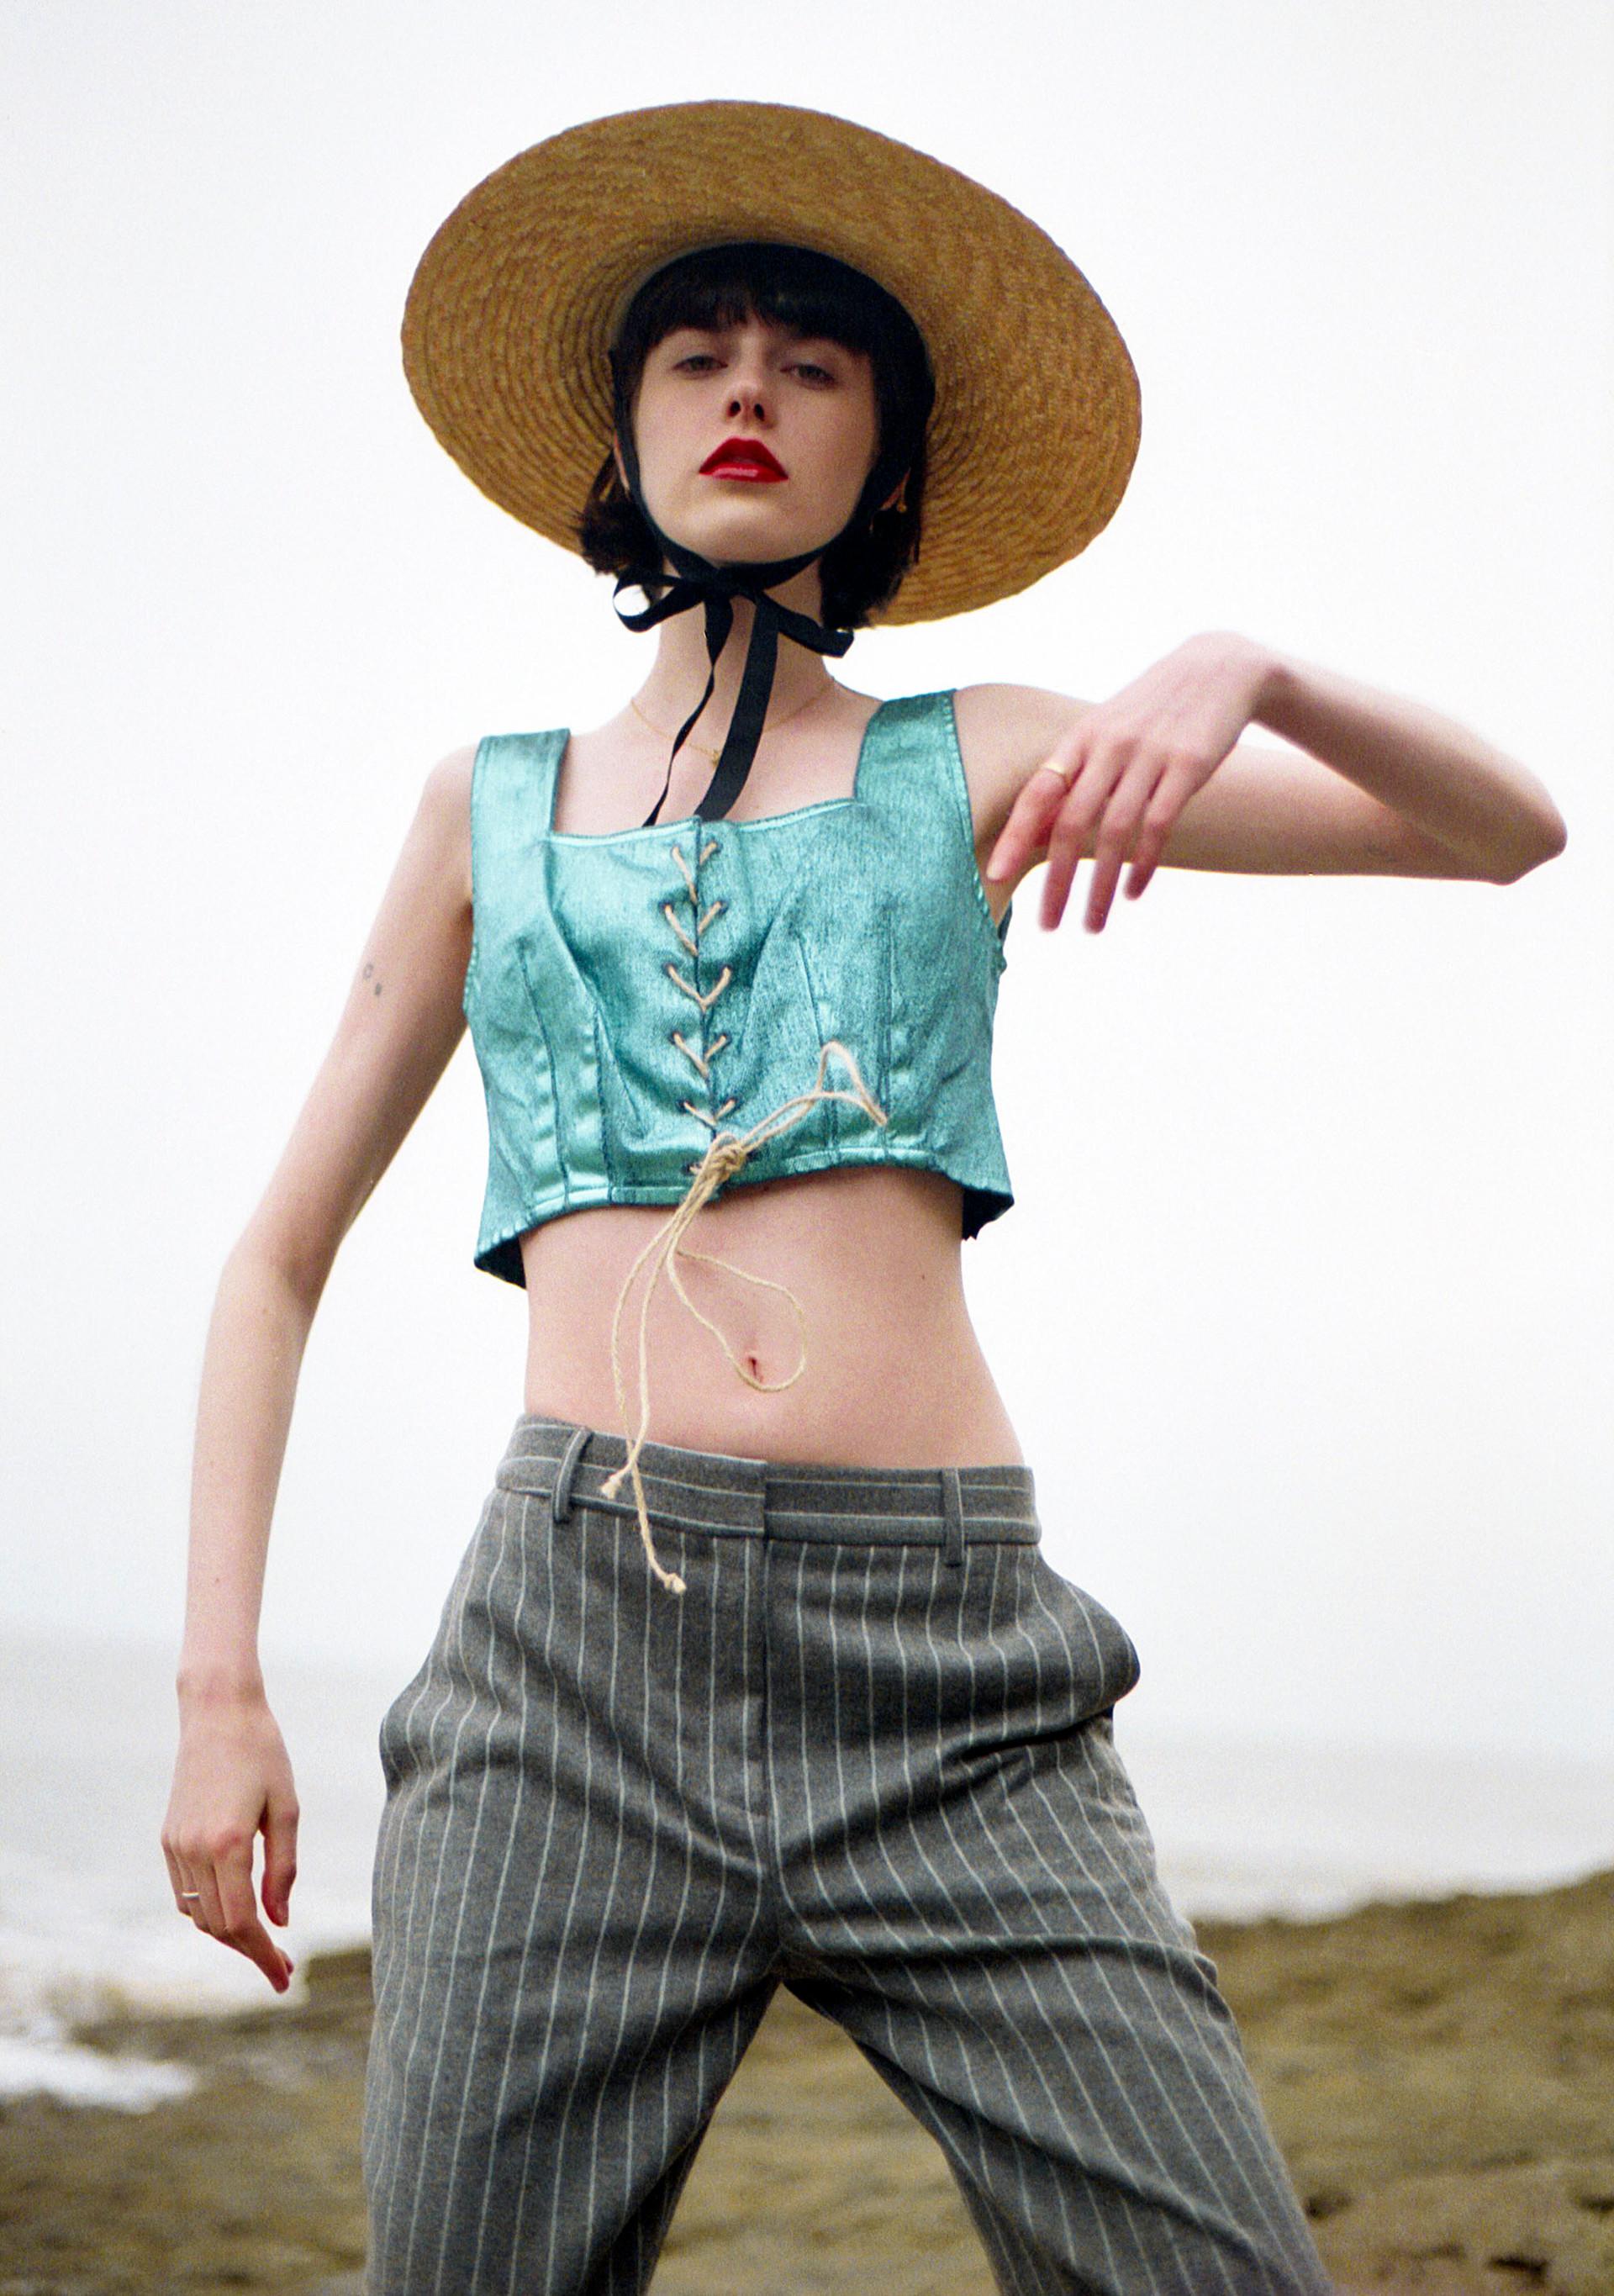 Charlotte O'Shea